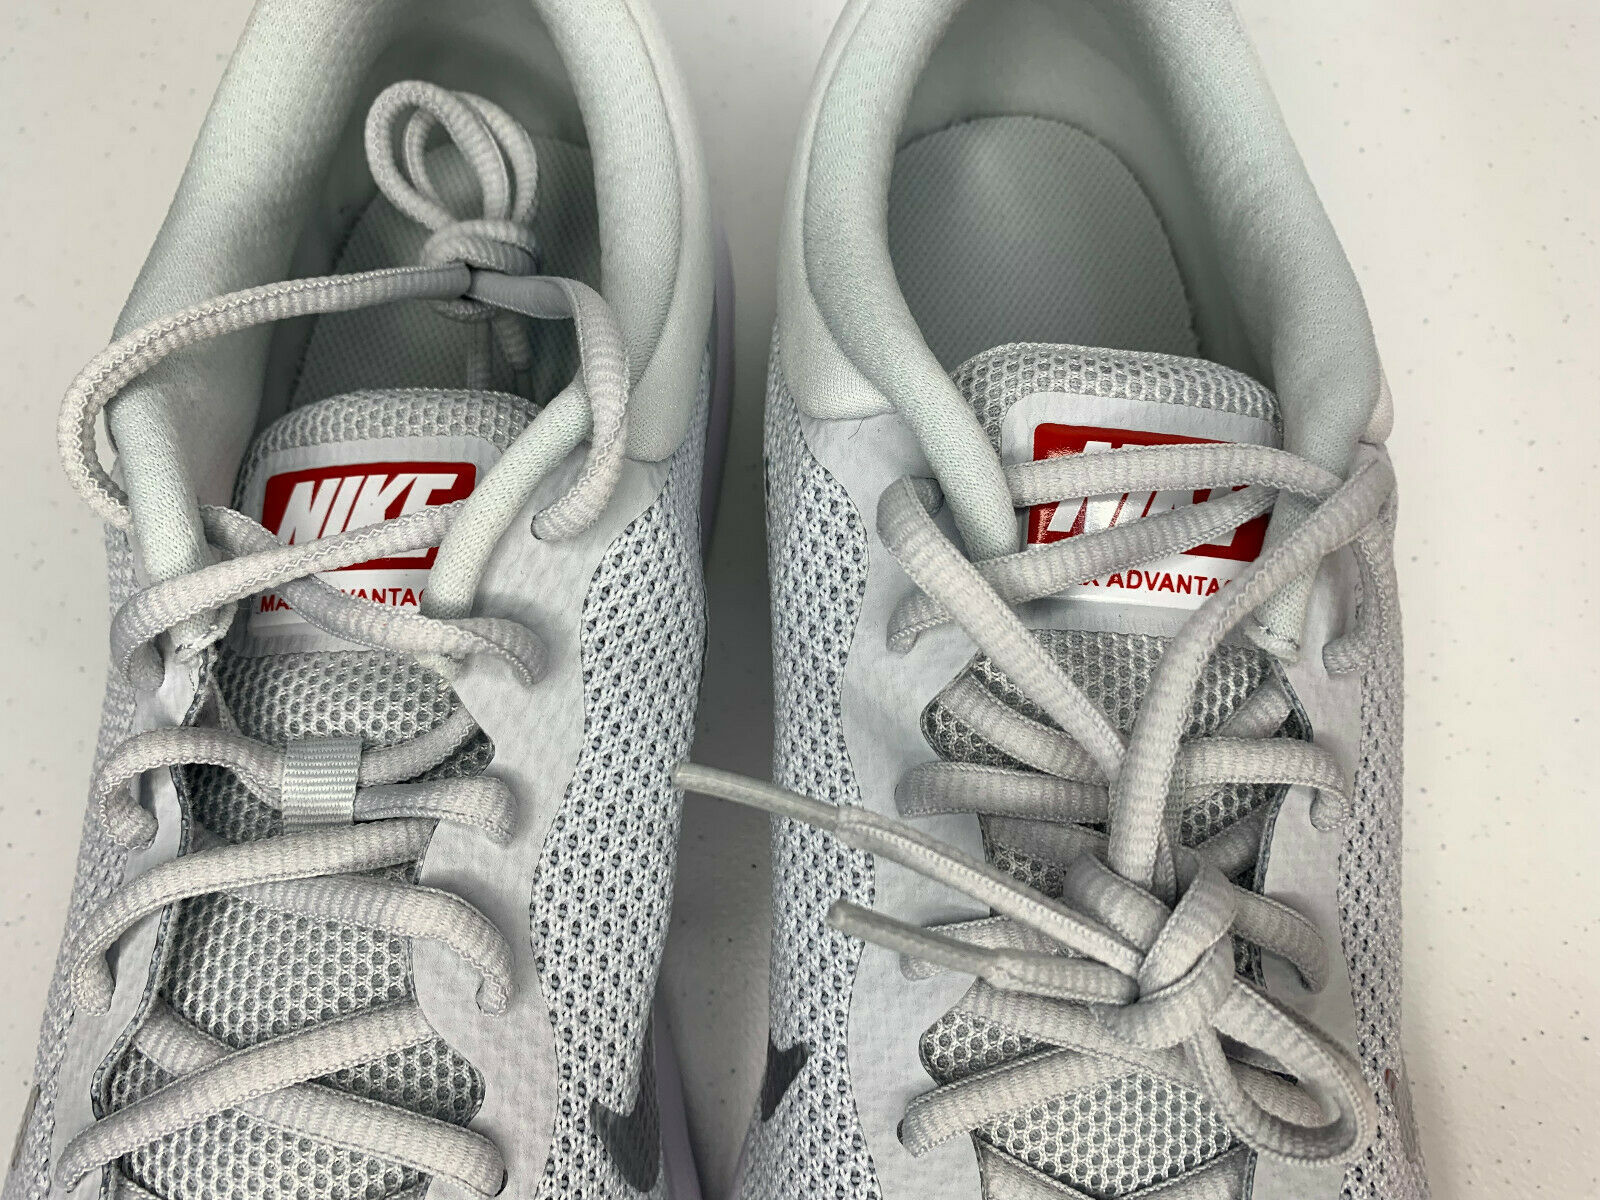 NIB SIZE 15 MEN Nike Air Max Advantage Running Shoes Platinum White Trainer NEW  image 3